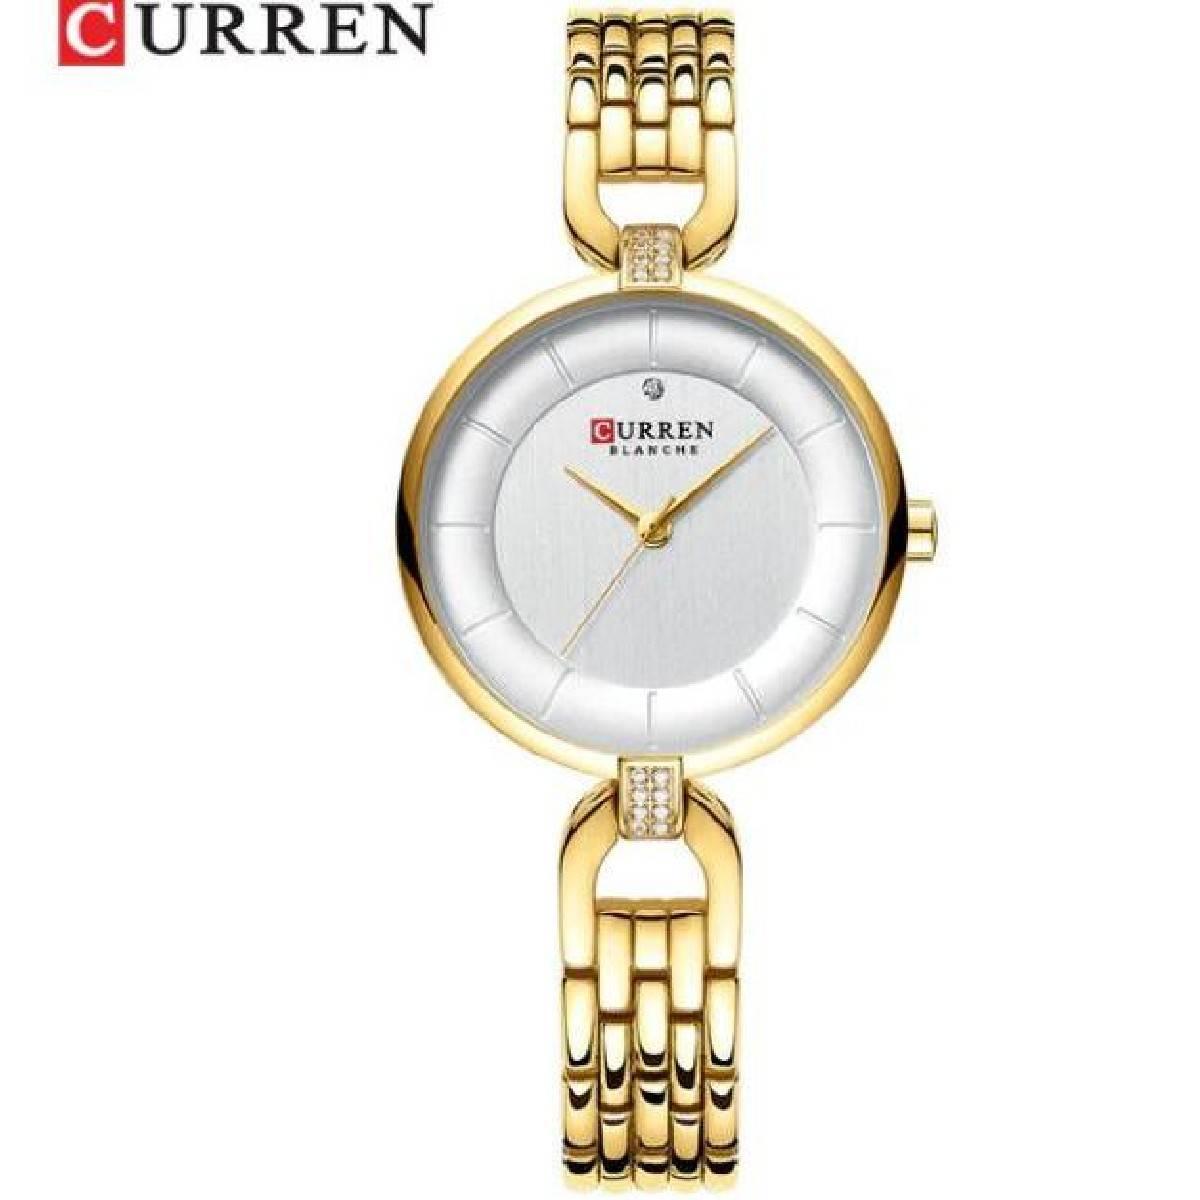 CURREN Latest 2020 Stainless Steel Waterproof Japan Quartz Wristwatch With Brand Box - 9052